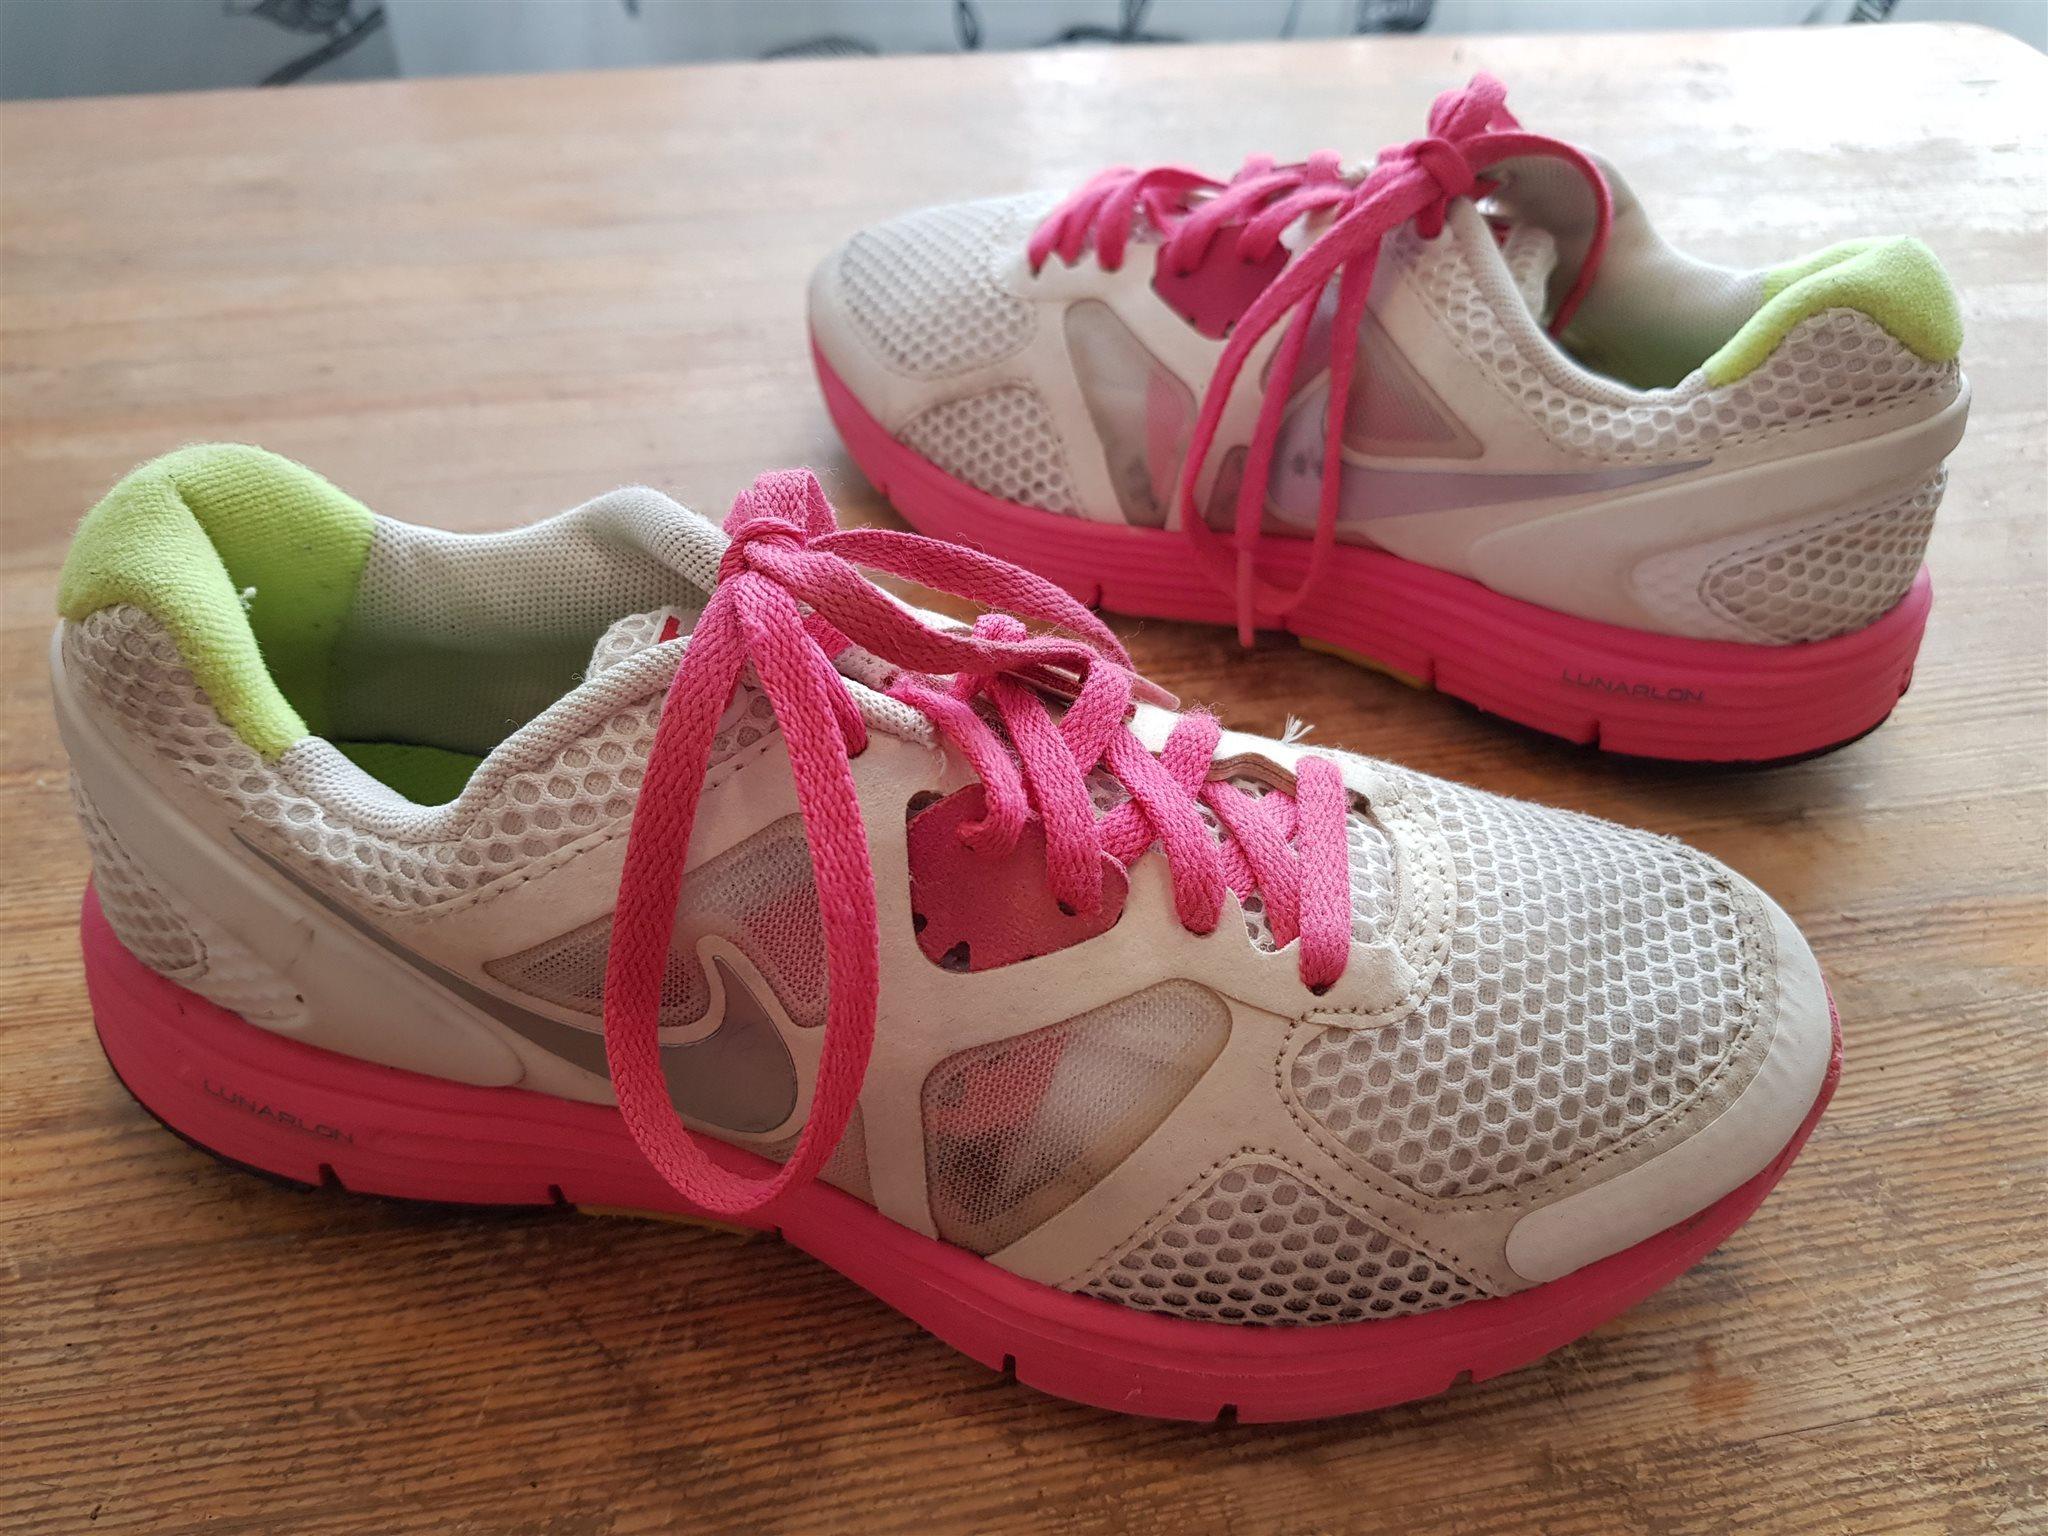 detailed look 9a67c b6dd4 ... half off 2cbef c99ff Löparskor sportskor Nike Lunarglide 3 Lunarlon str  35,5 i fint